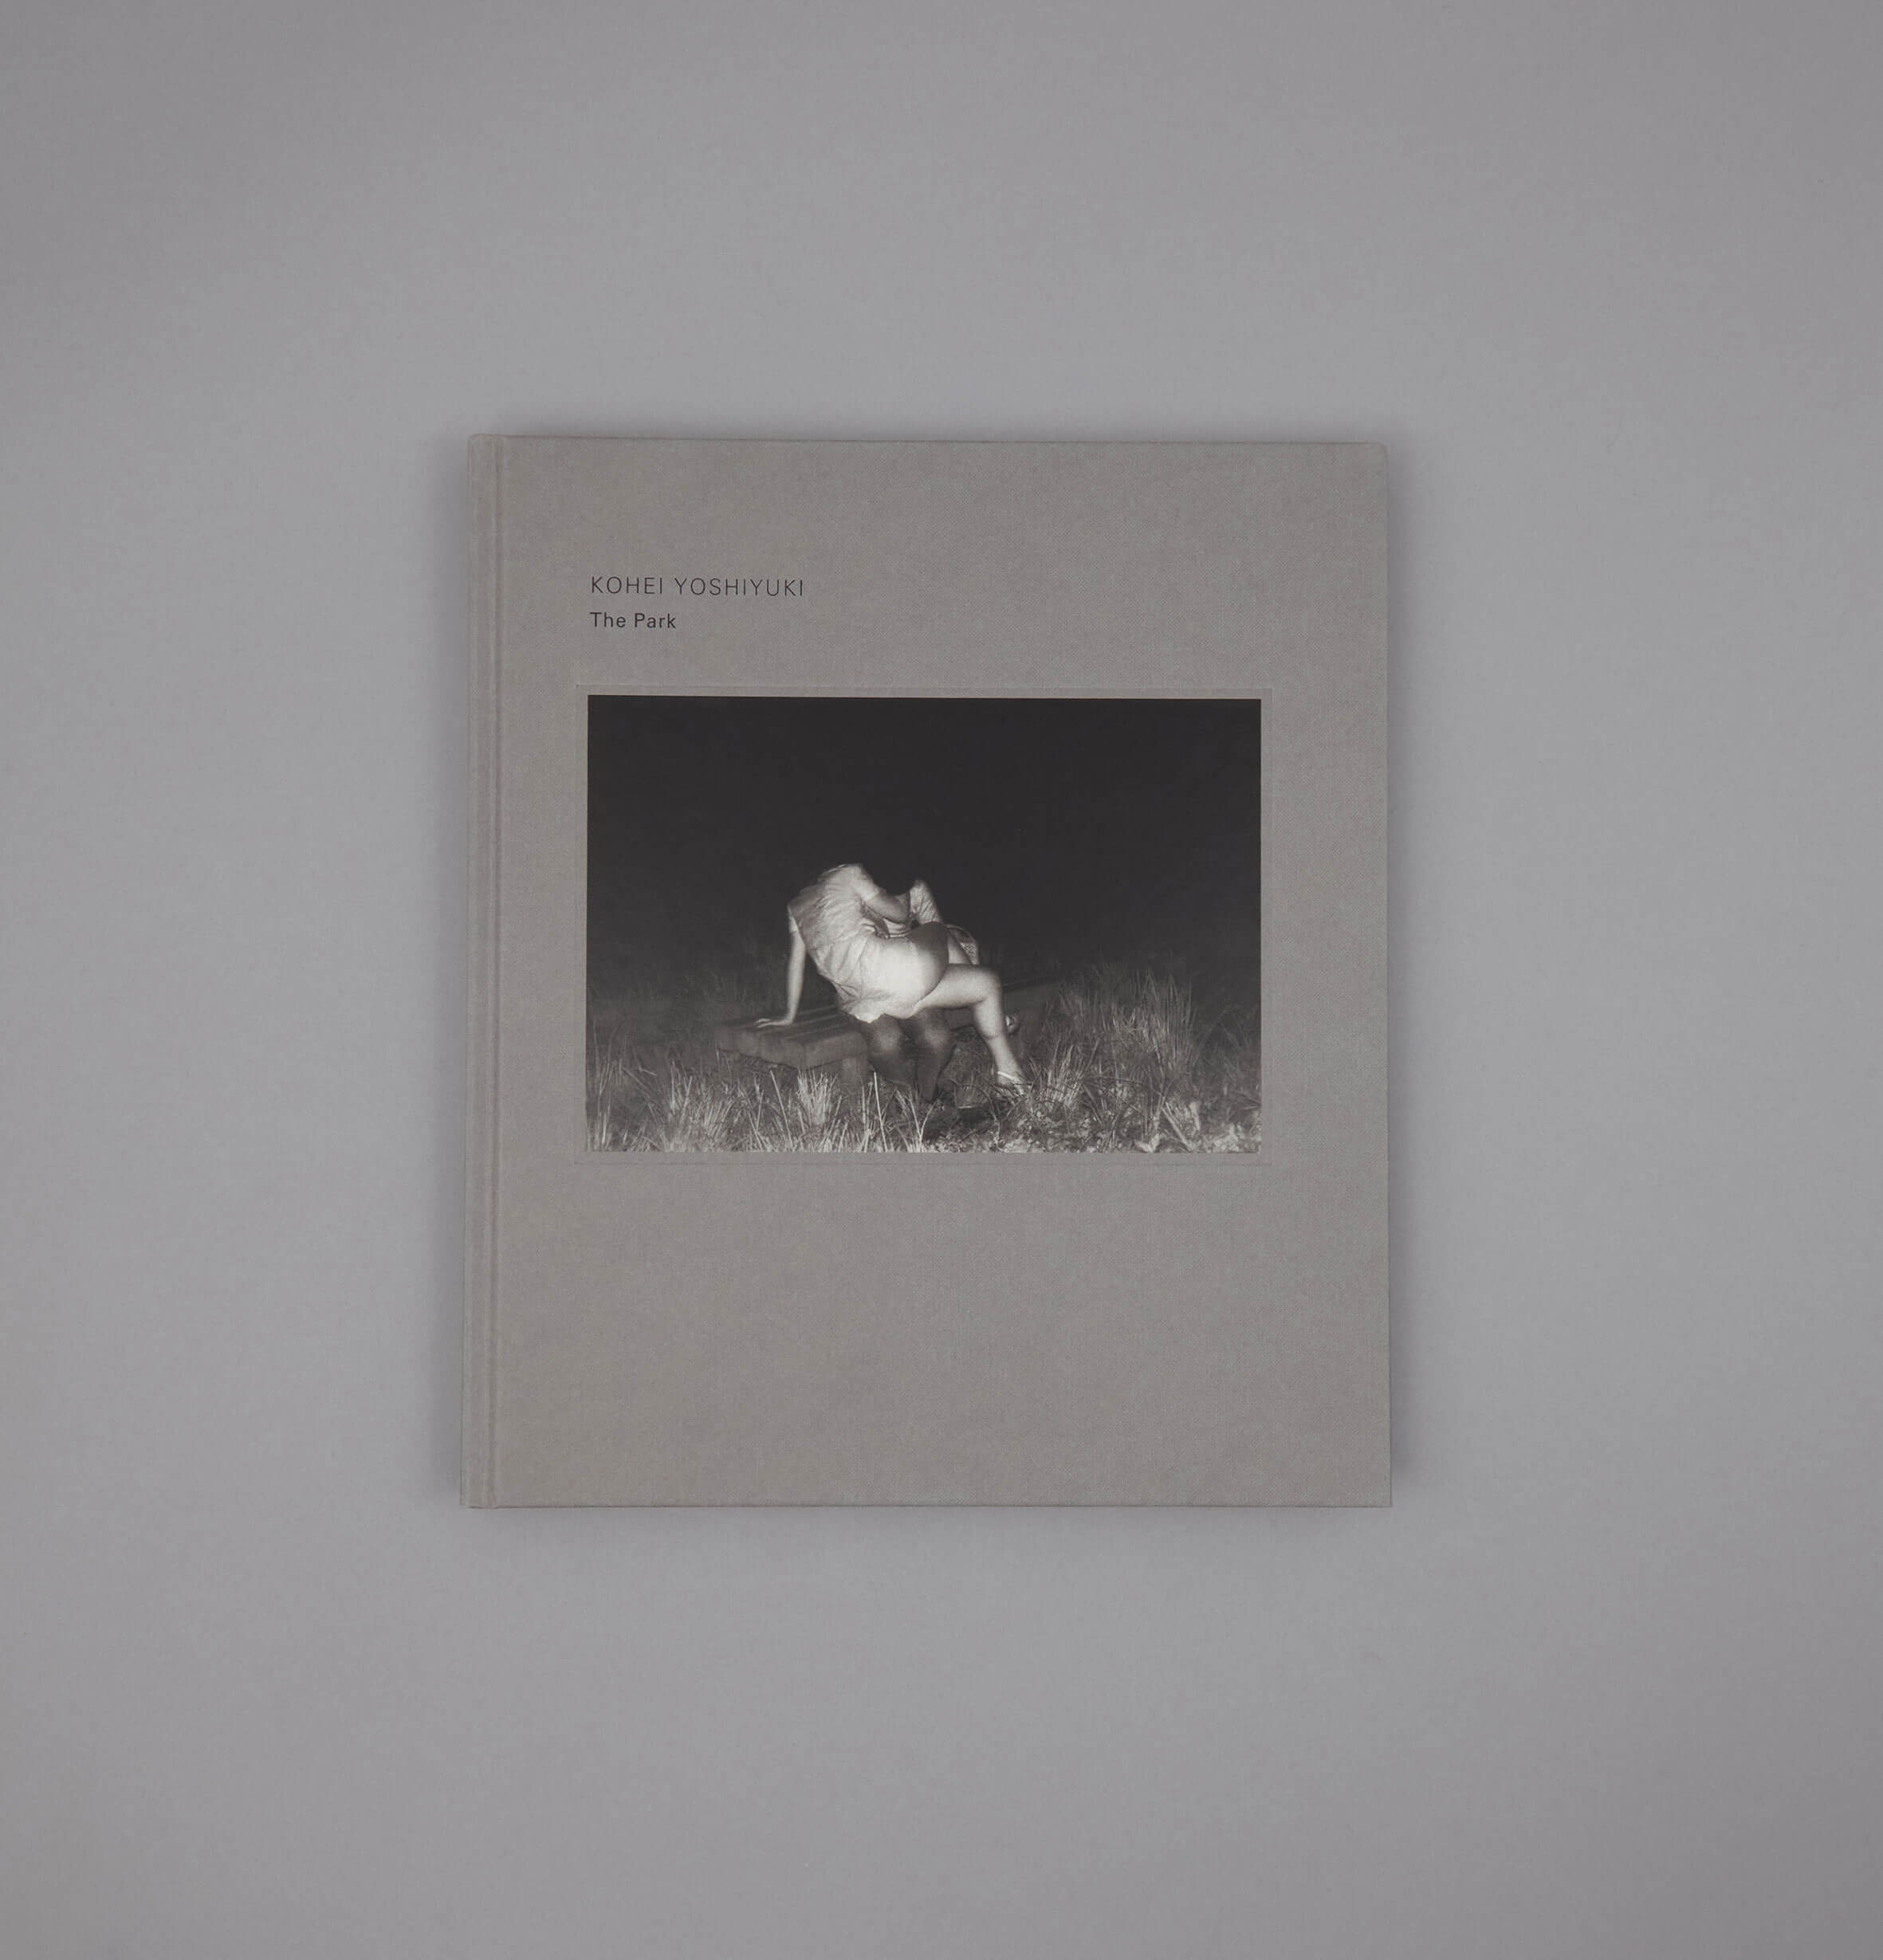 THEPARK-couve-Yoshiyuki-delpire